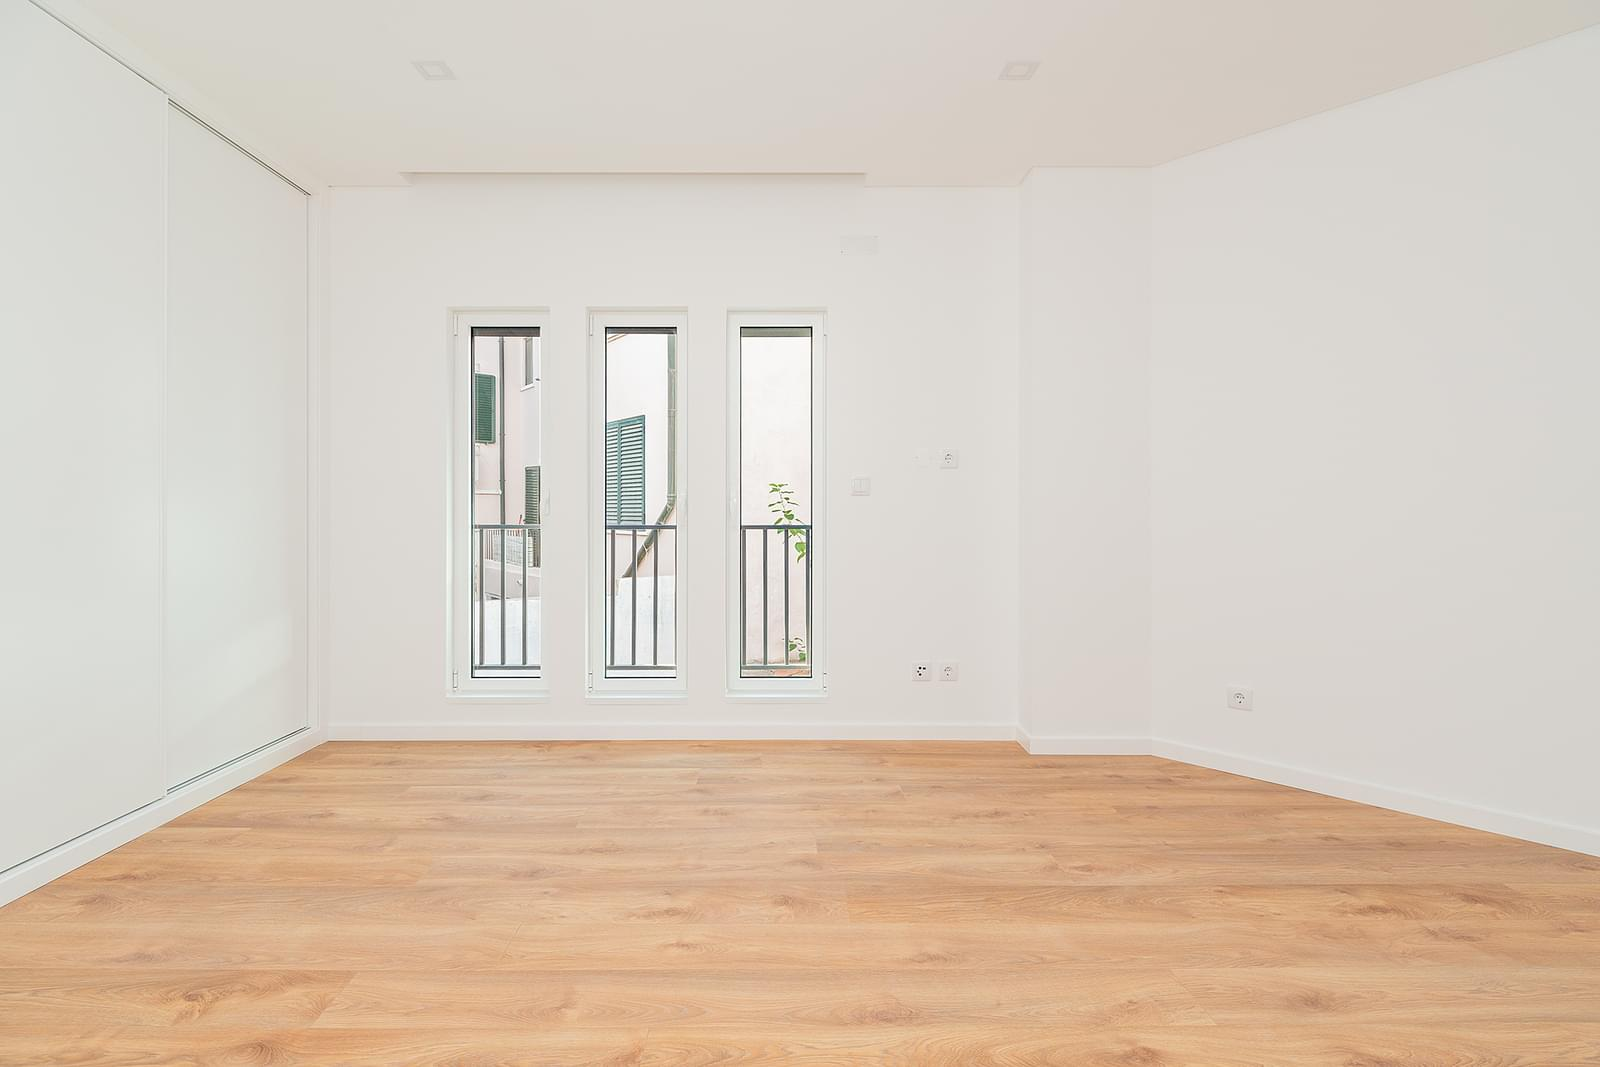 pf16829-apartamento-t1-lisboa-d963d20b-ed71-47e1-b6c0-af2bd1b4782b